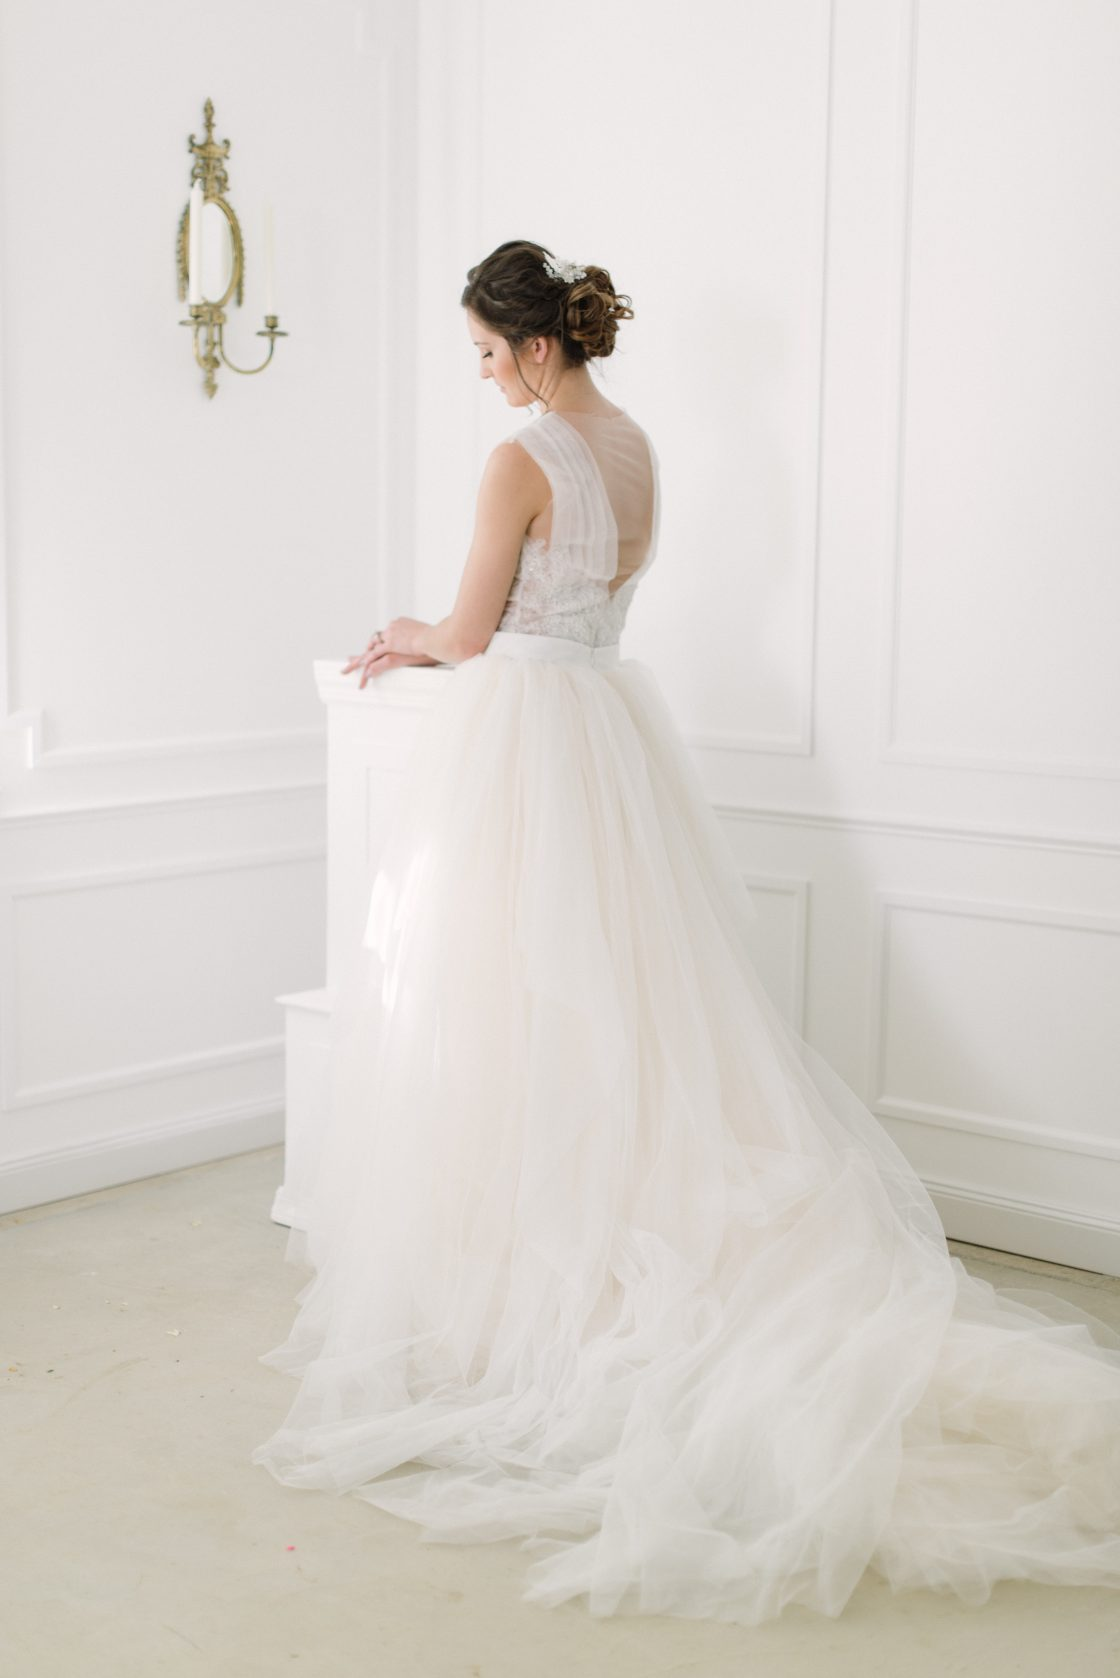 Elegant European Inspired Wedding Shoot 6